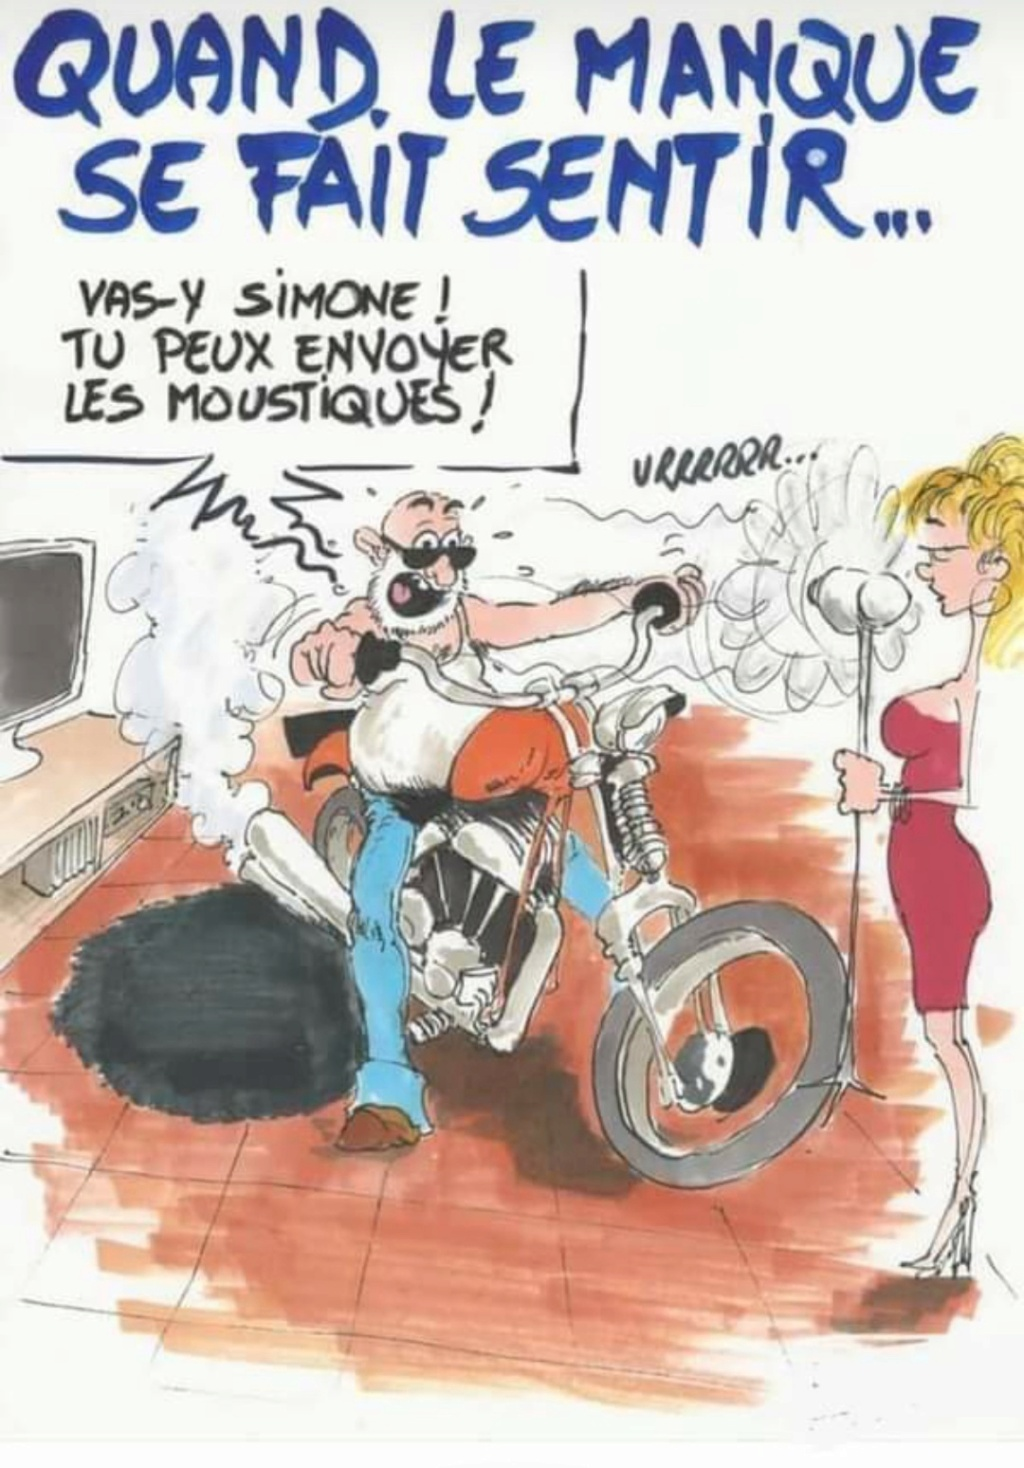 Humour en image du Forum Passion-Harley  ... - Page 5 20210110